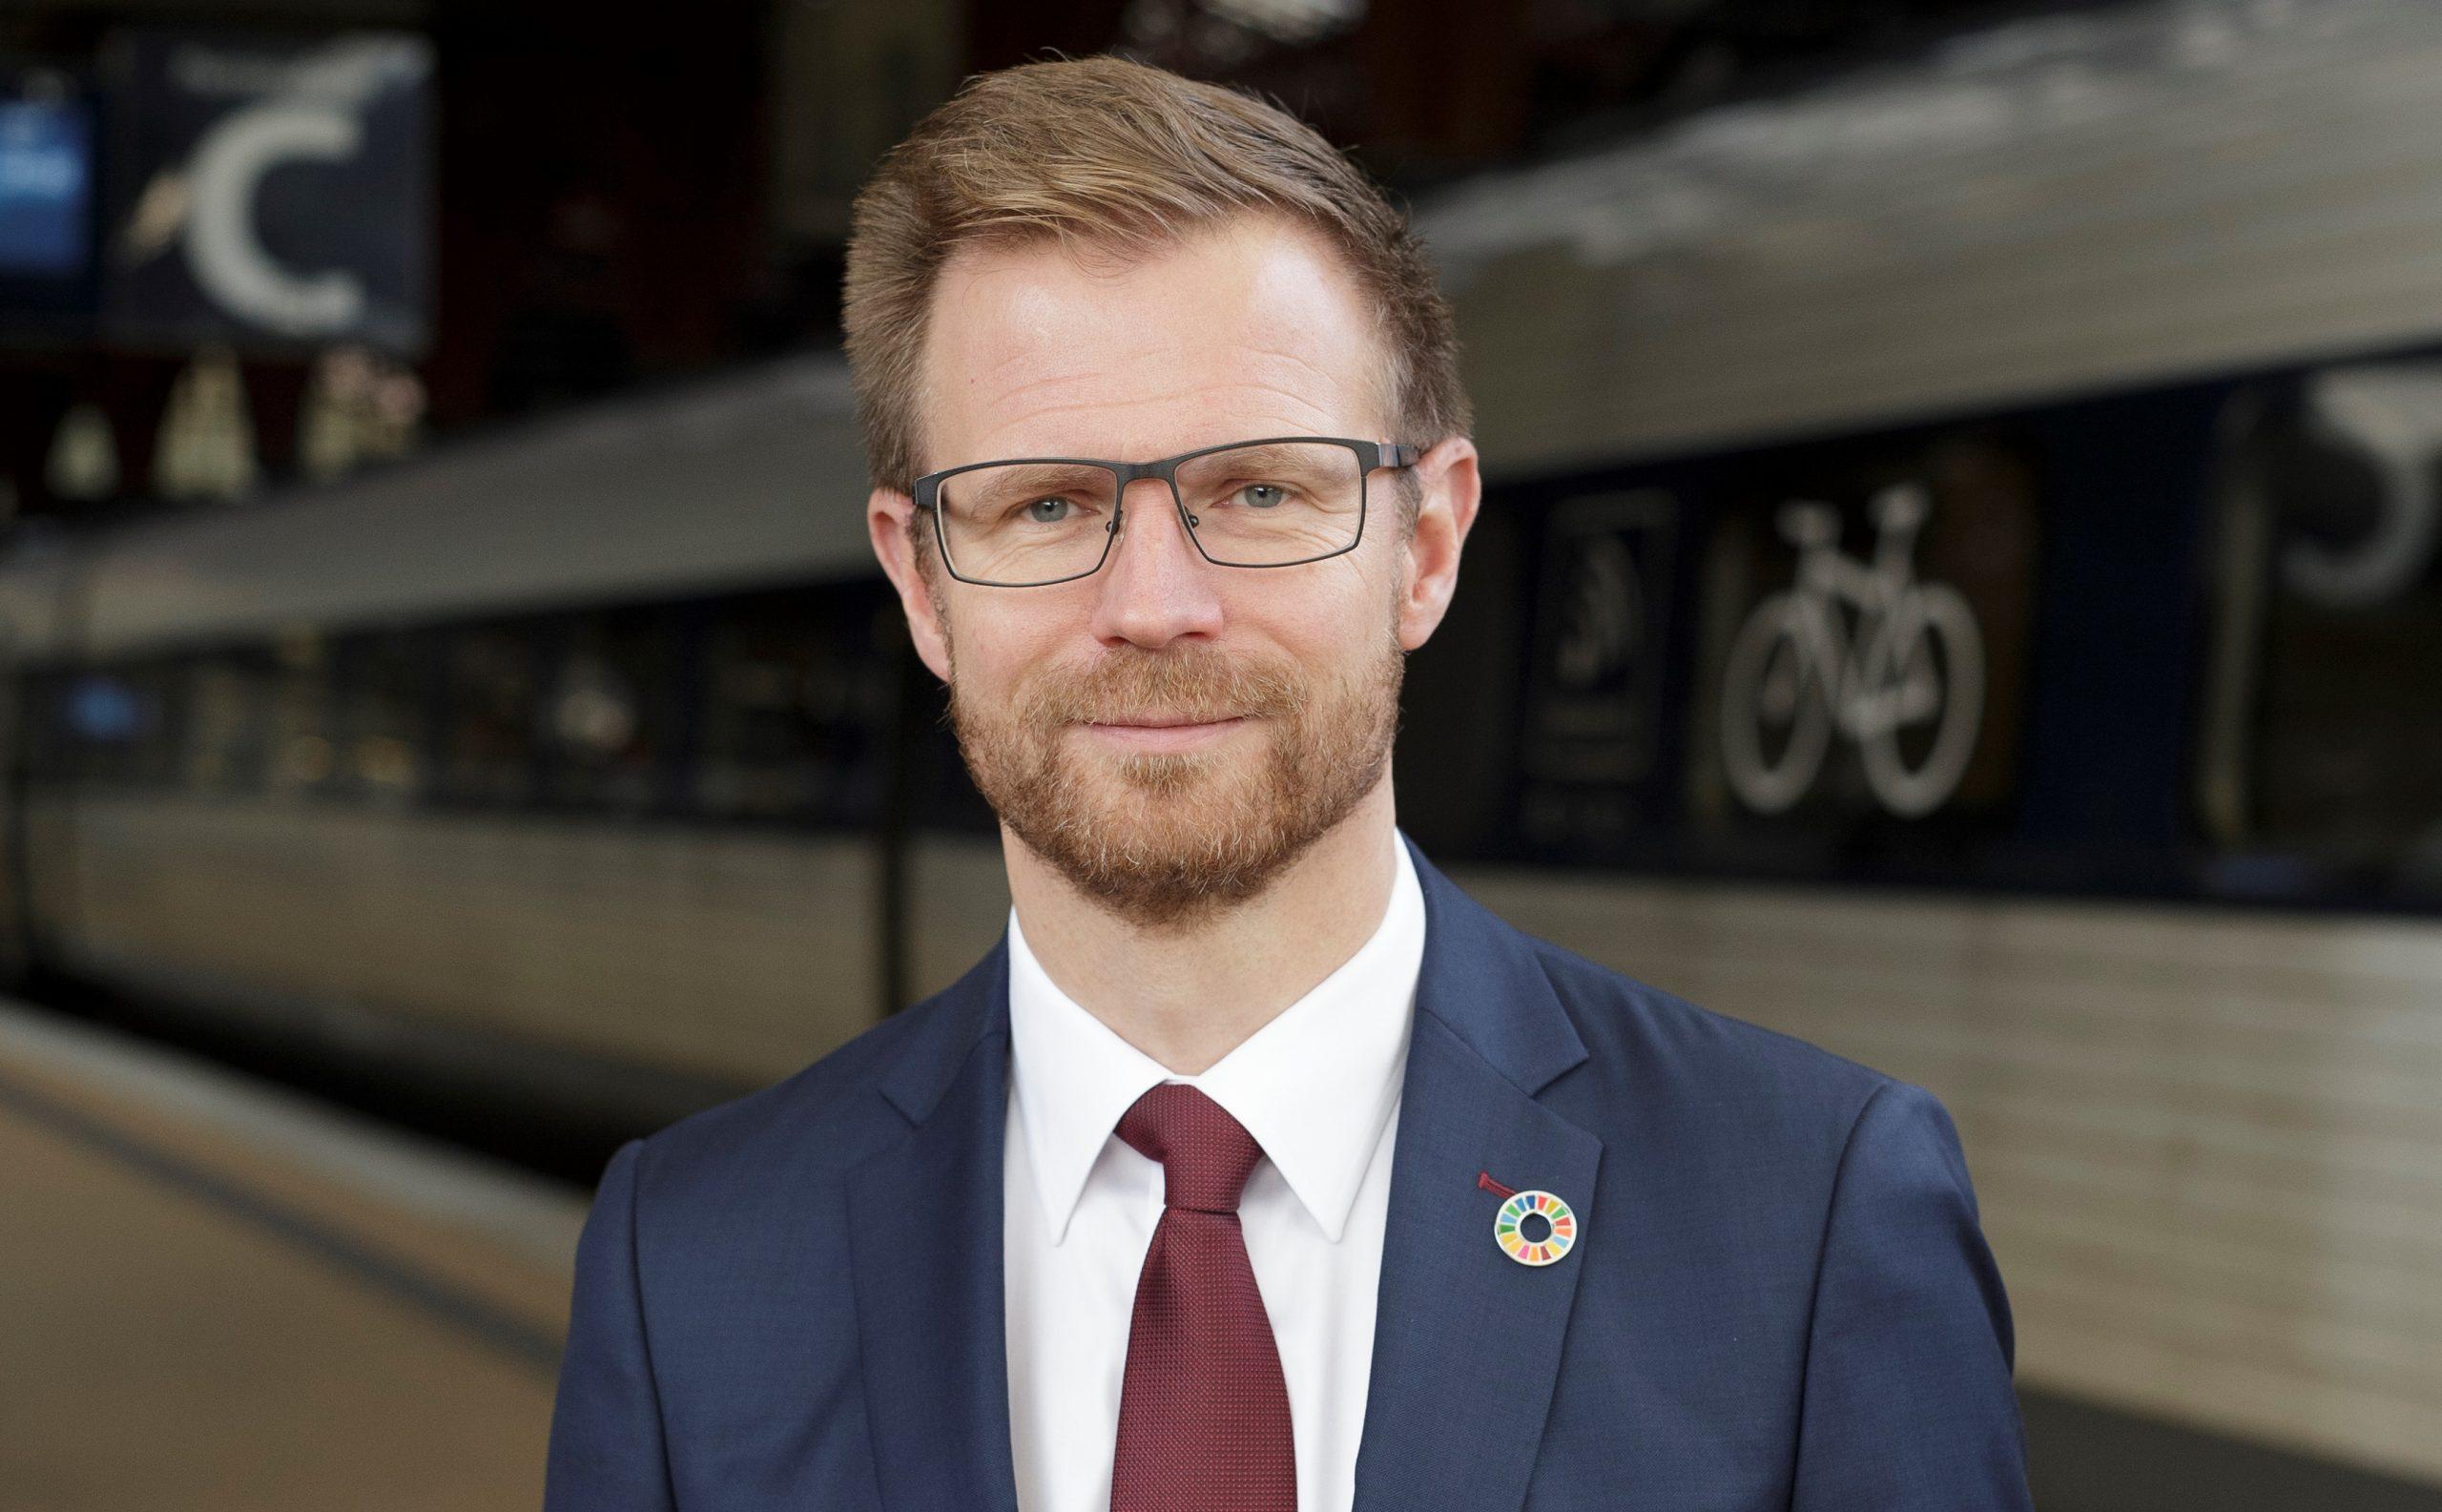 Transportminister Benny Engelbrecht. (Foto: Nicolai Perjesi)